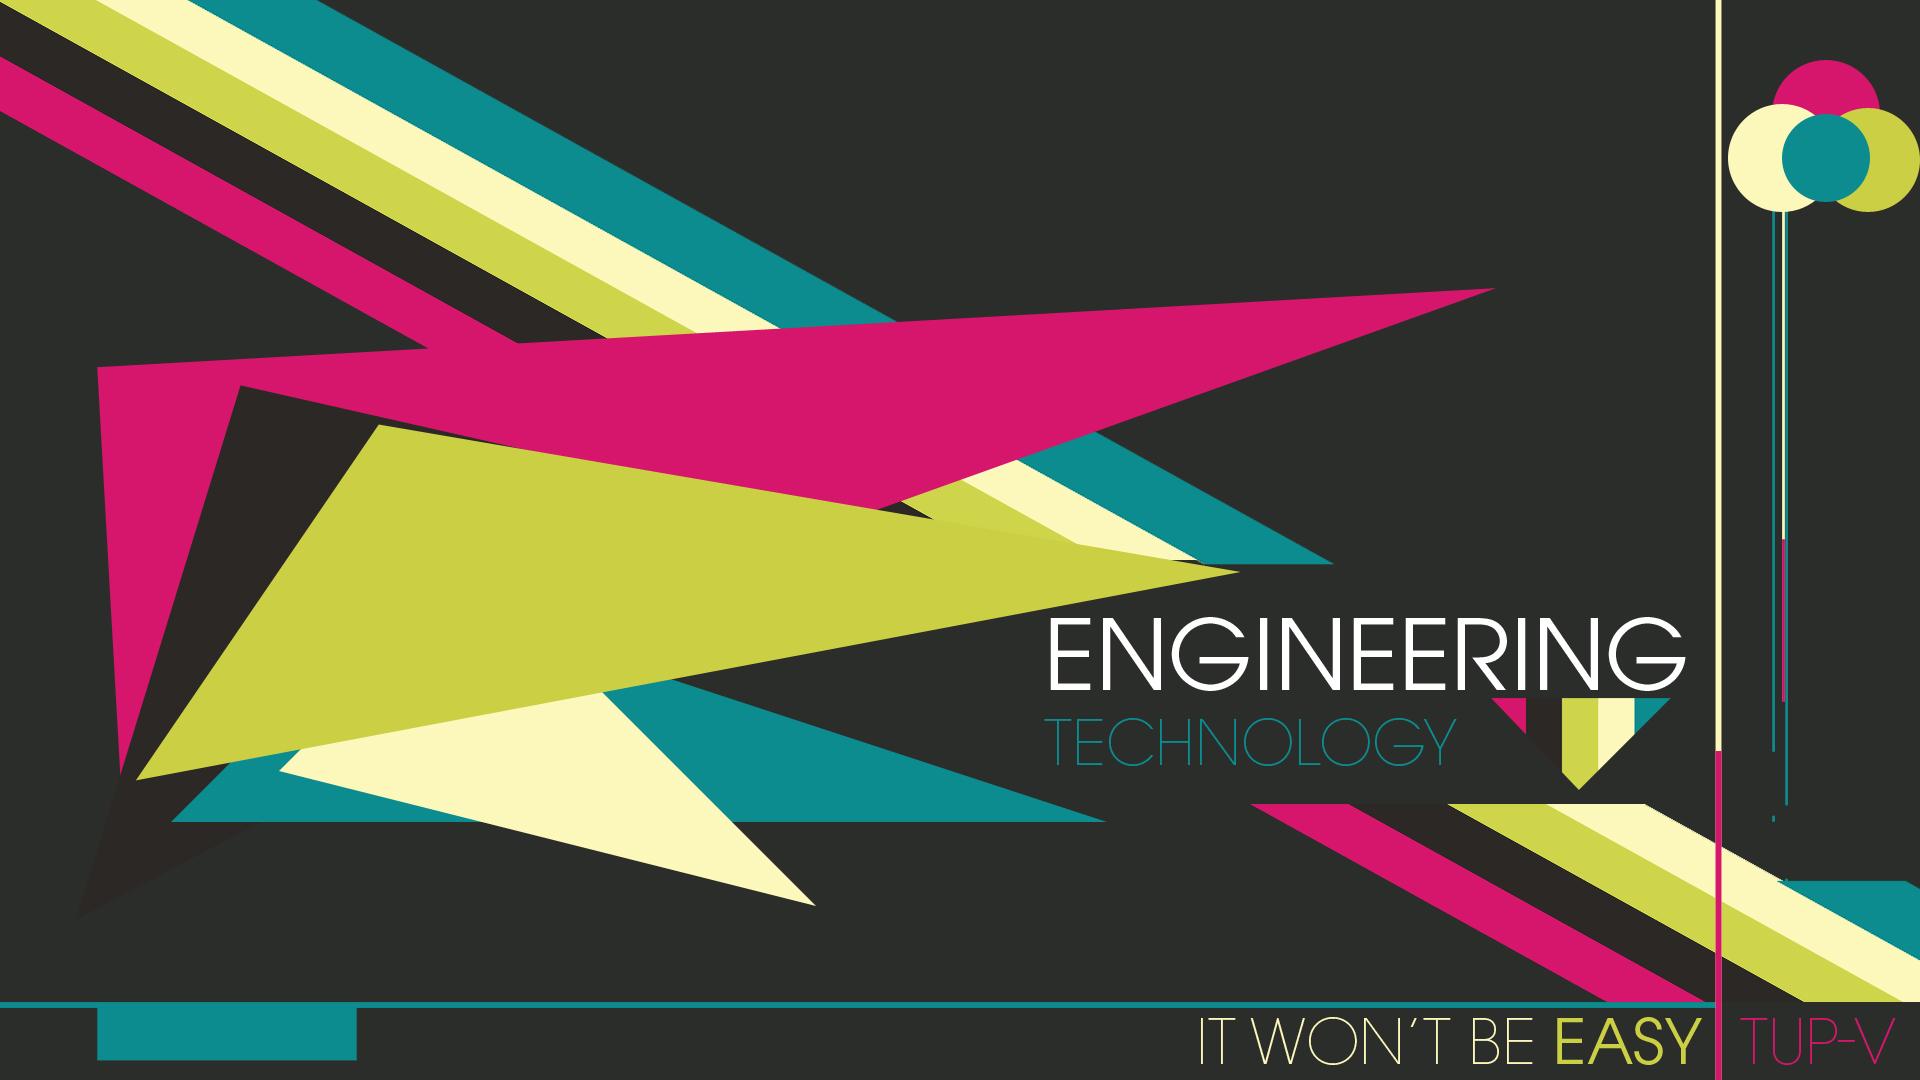 Engineers Wallpaper by ARTartisan 1920x1080